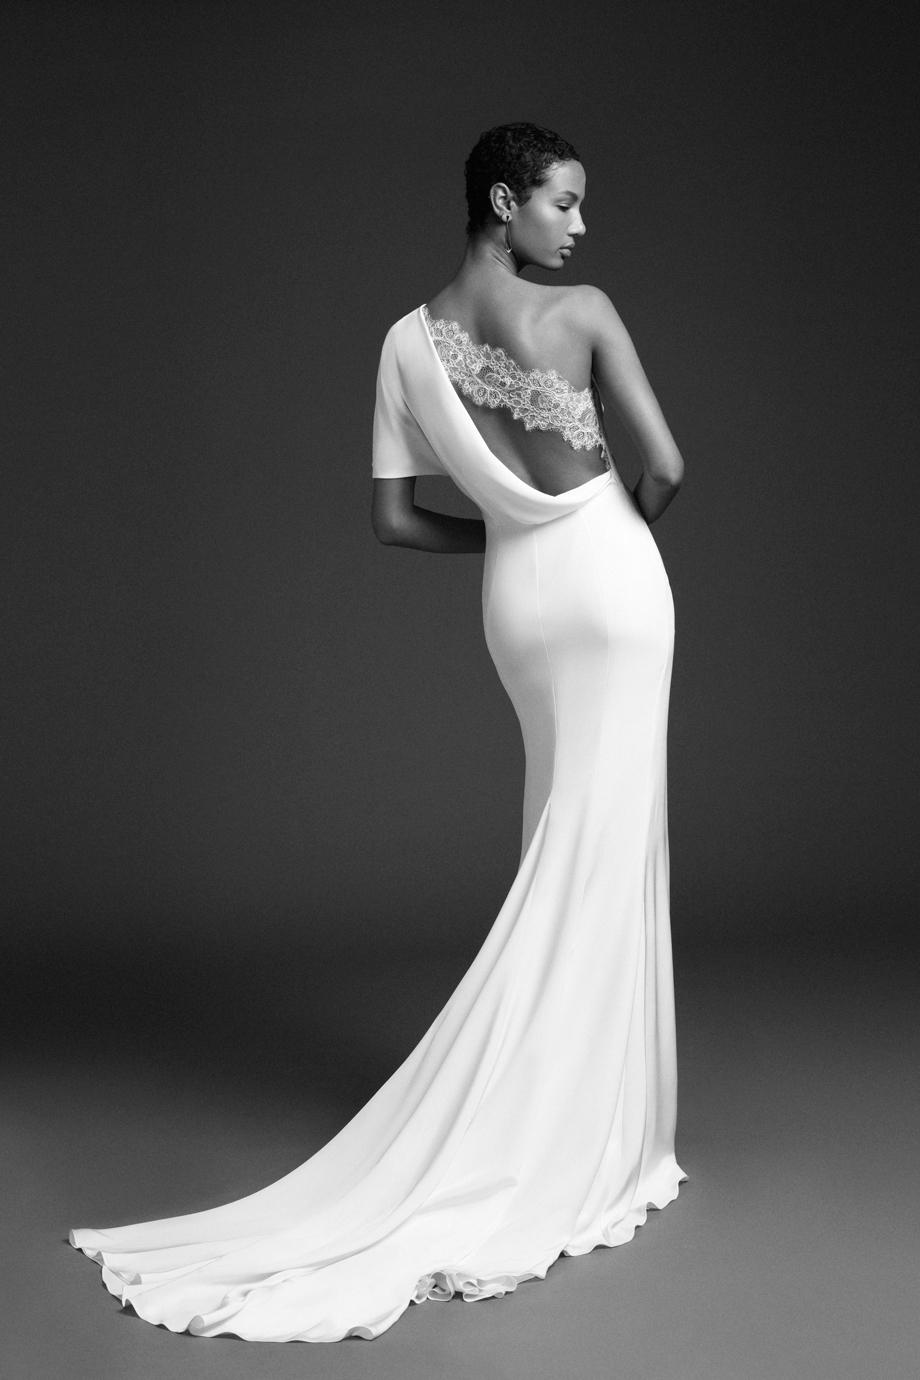 Cushnie wedding dresses wedding planner France